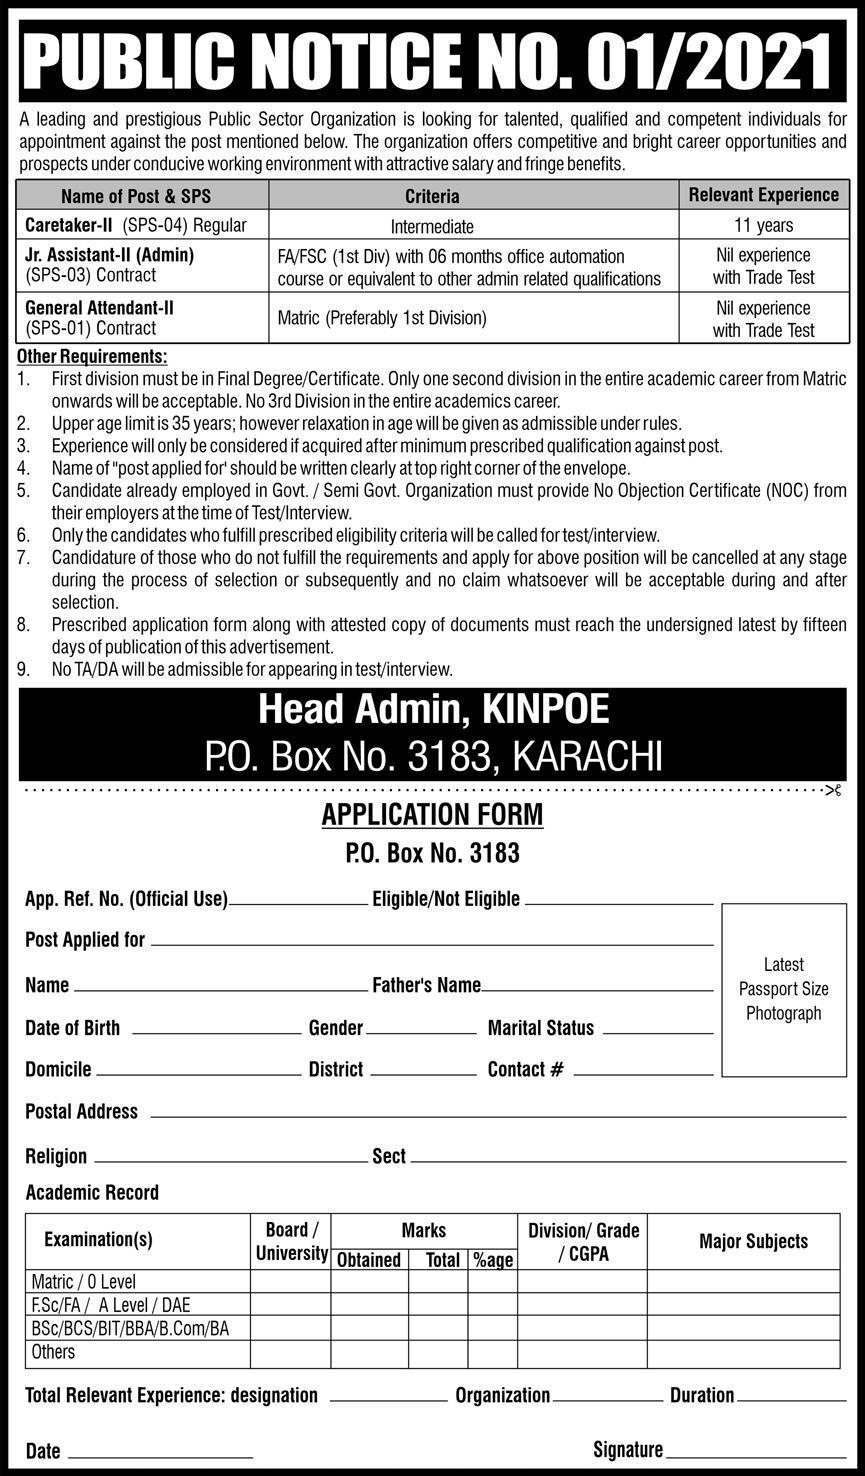 Karachi Institute of Power Engineering KINPOE Jobs 2021